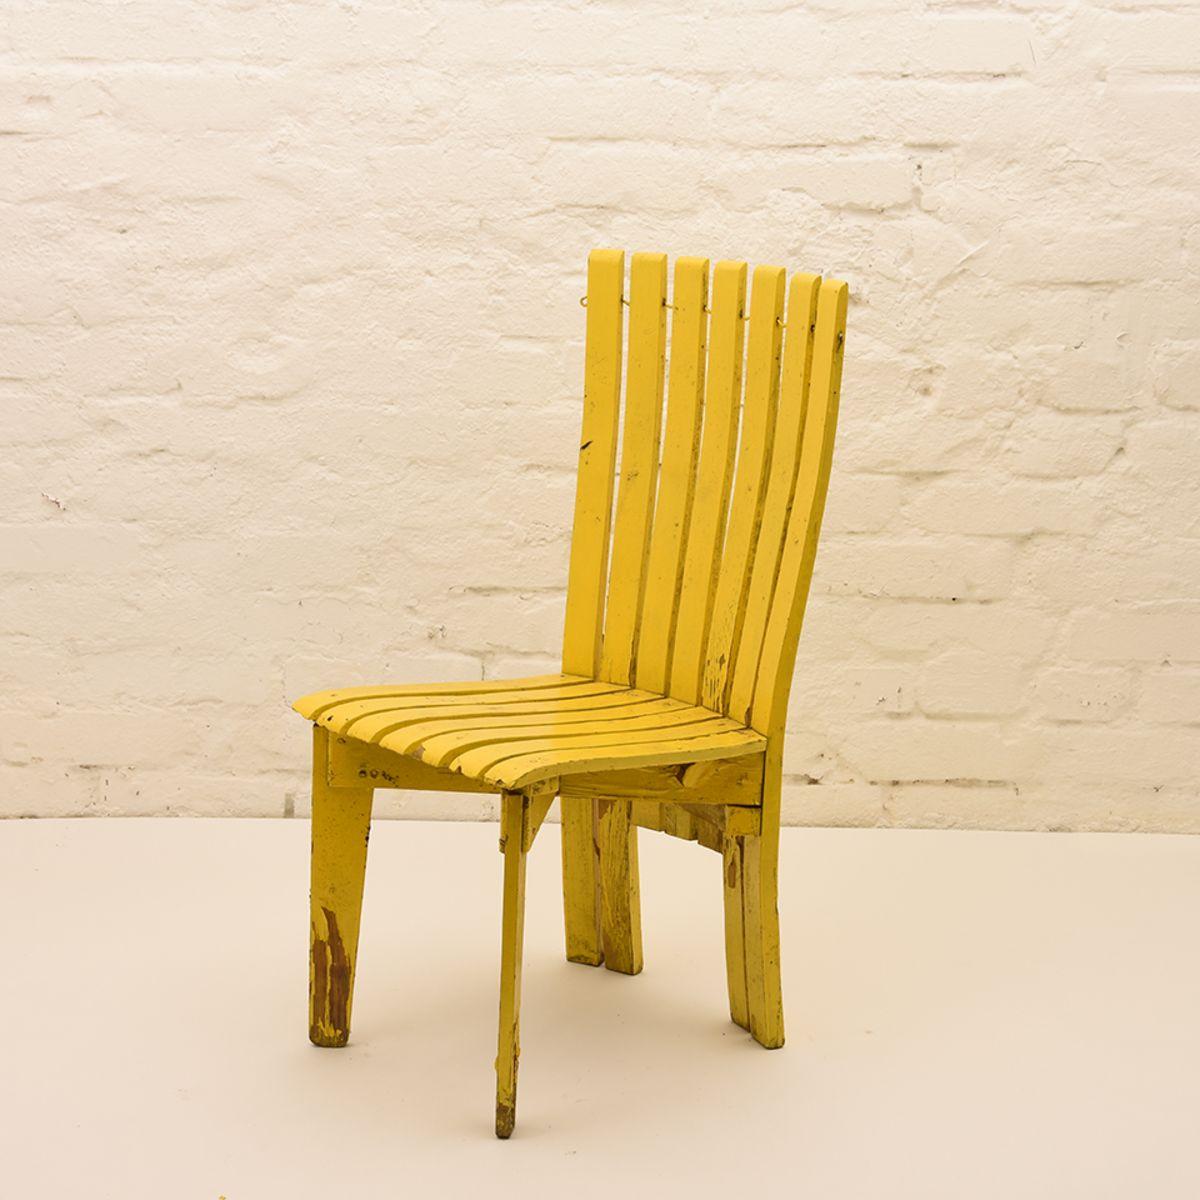 Alvar-Aalto_Sunflower-Garden-Chair-Yellow